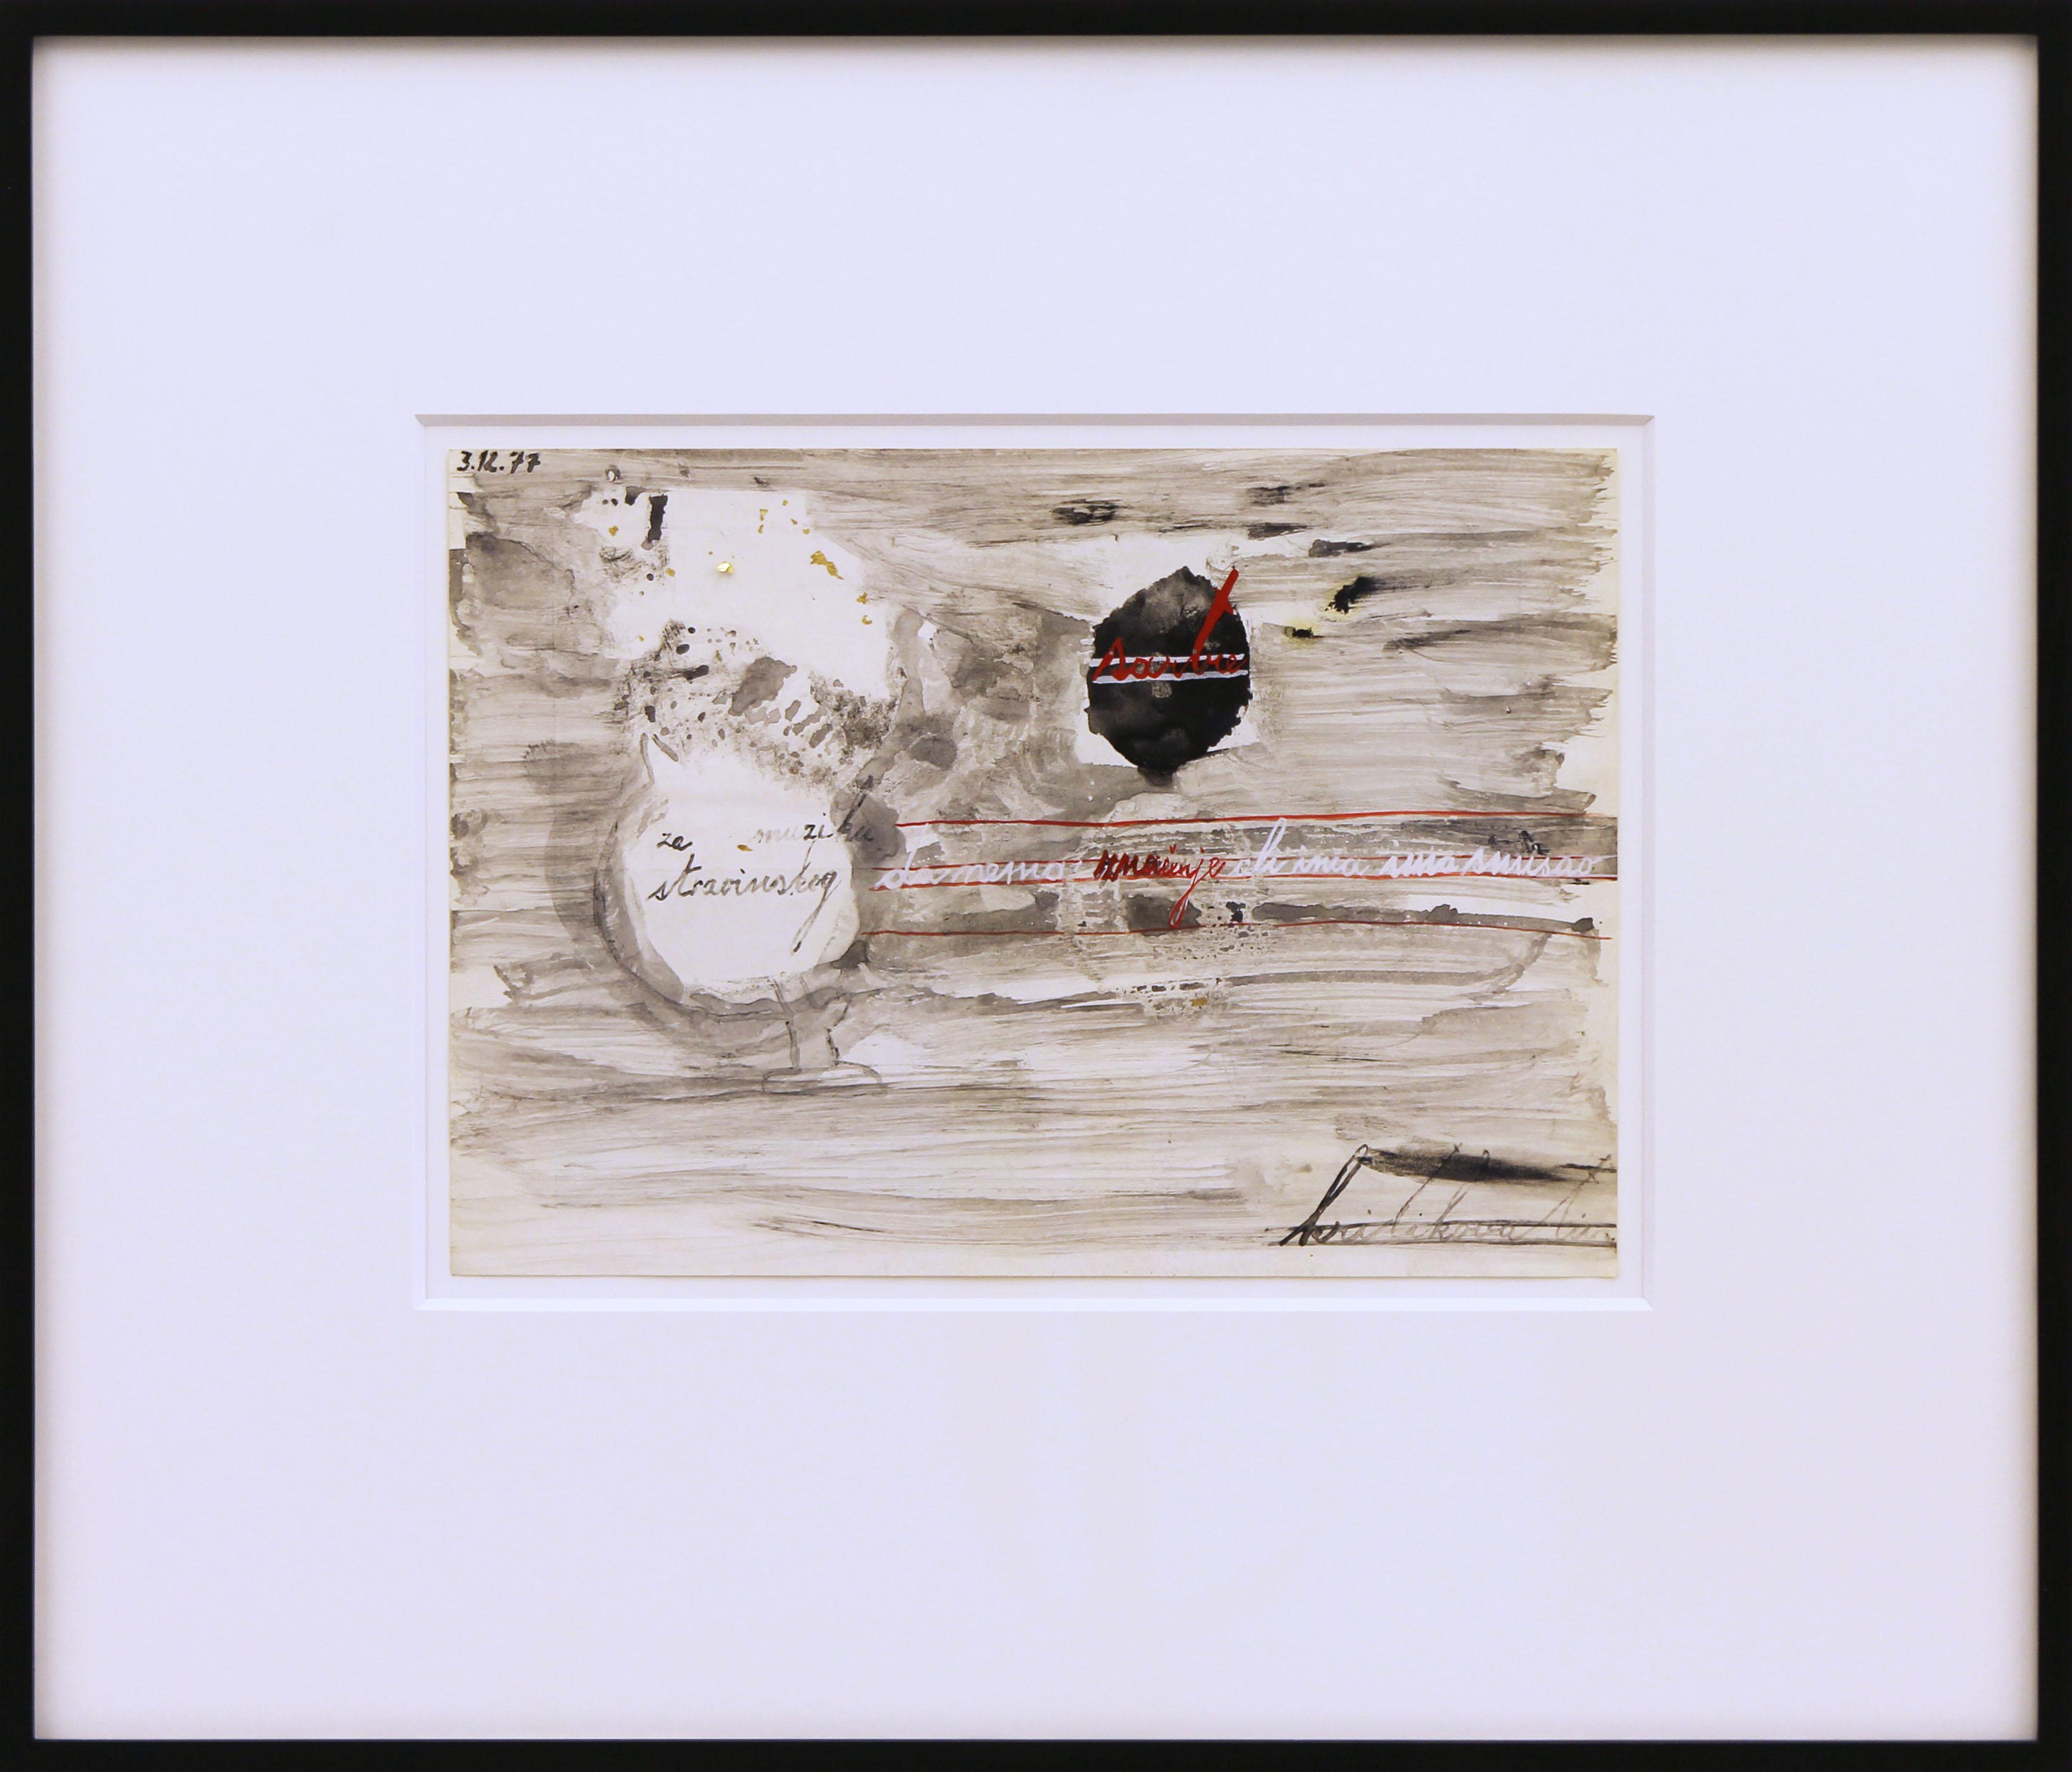 3.12.77, 36.5 x 42.5 x 3 cm, 1977